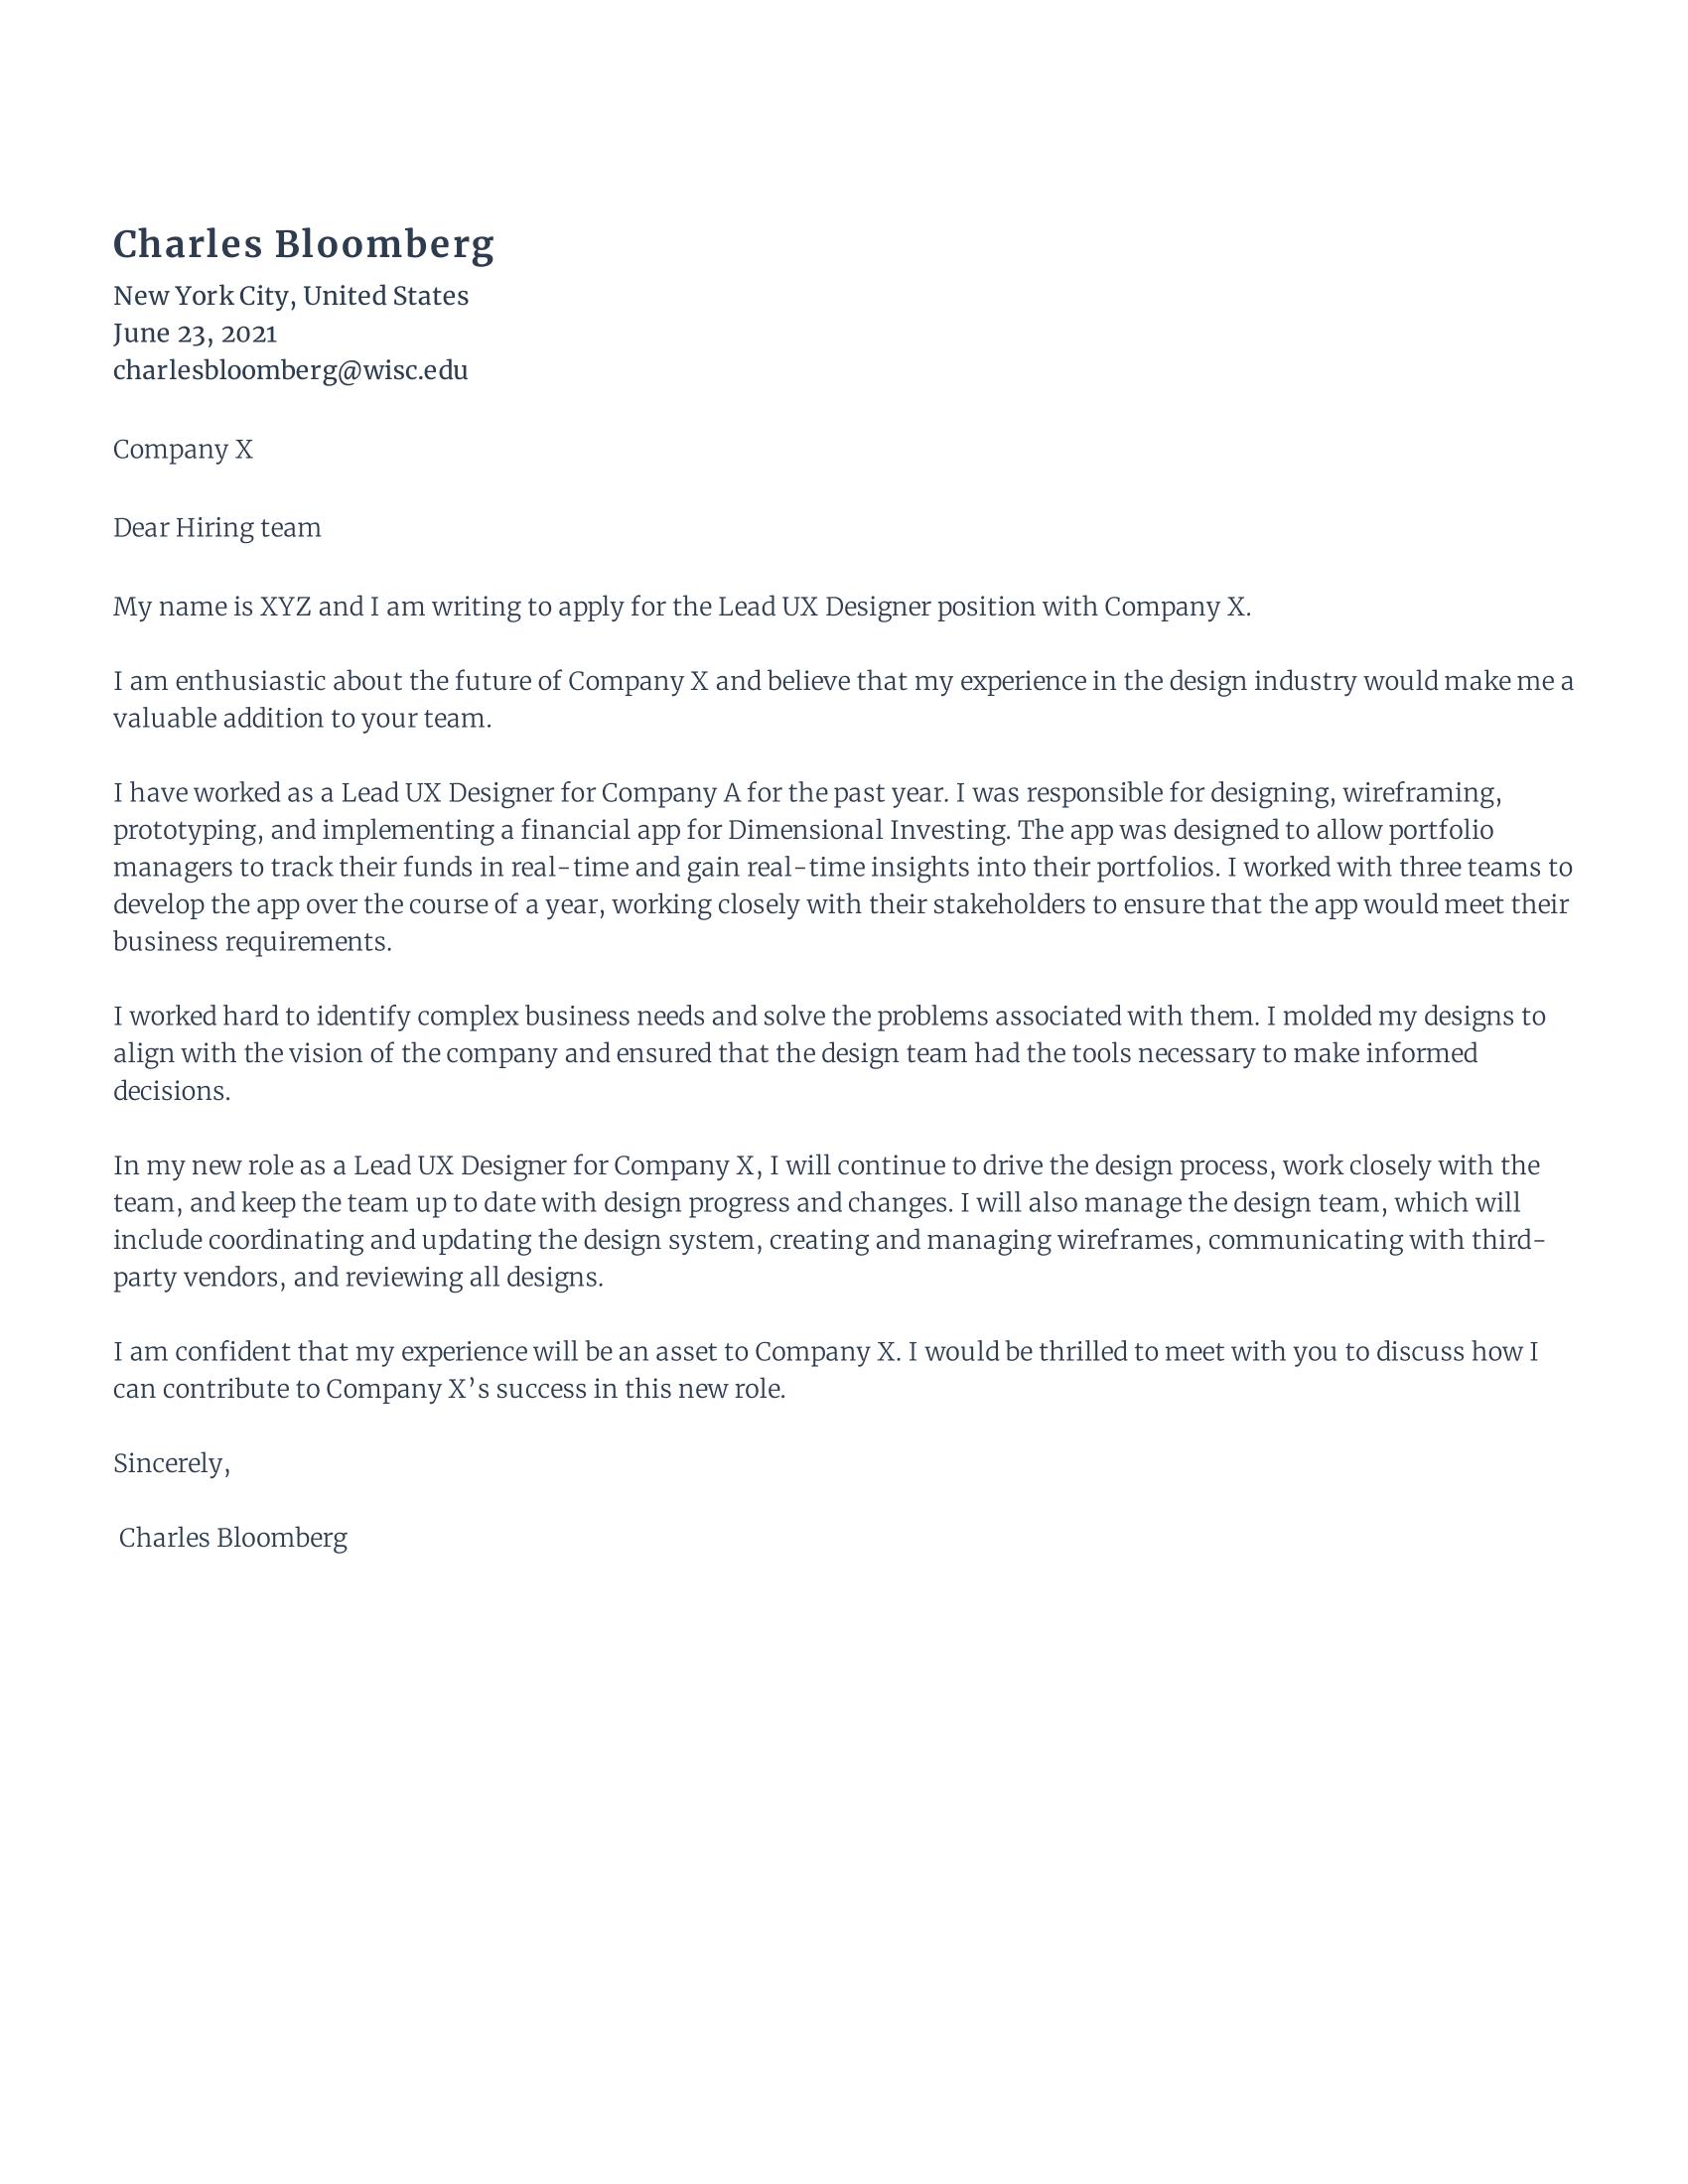 Lead UX Designer Cover Letter